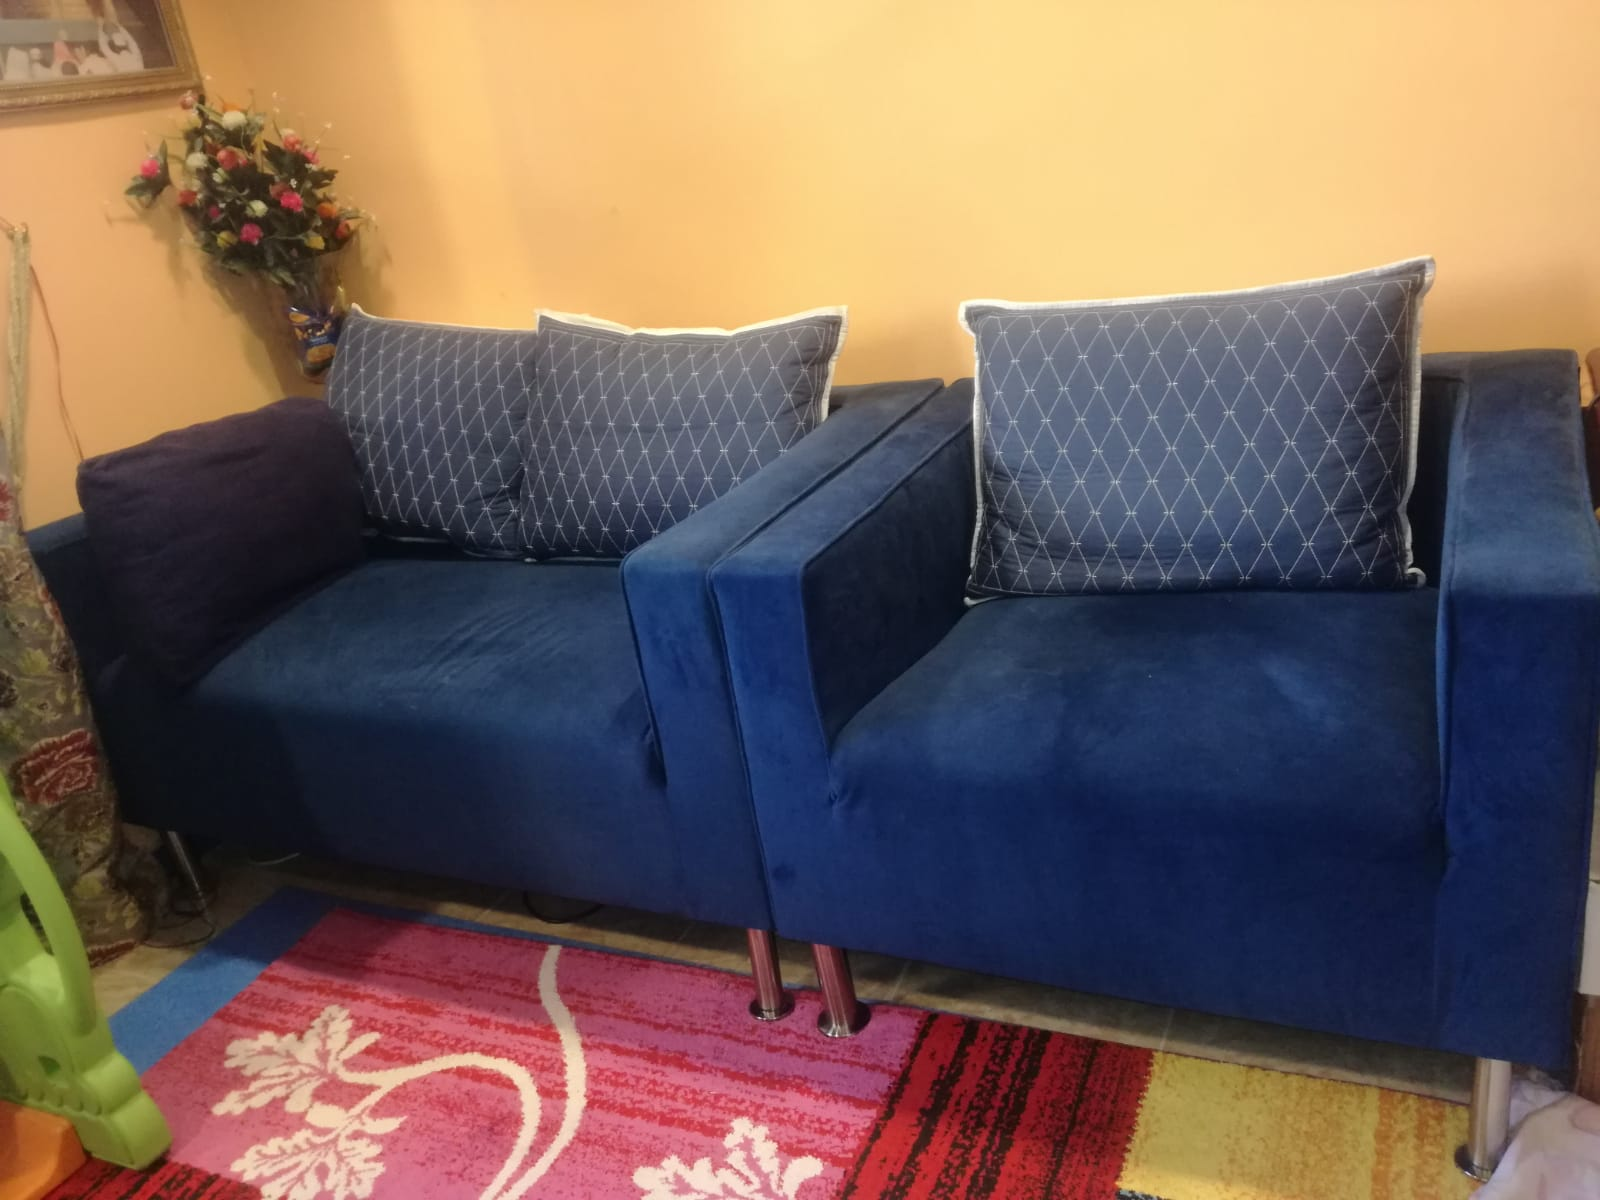 Affordable IKEA sofa set & LED tv with shelf!